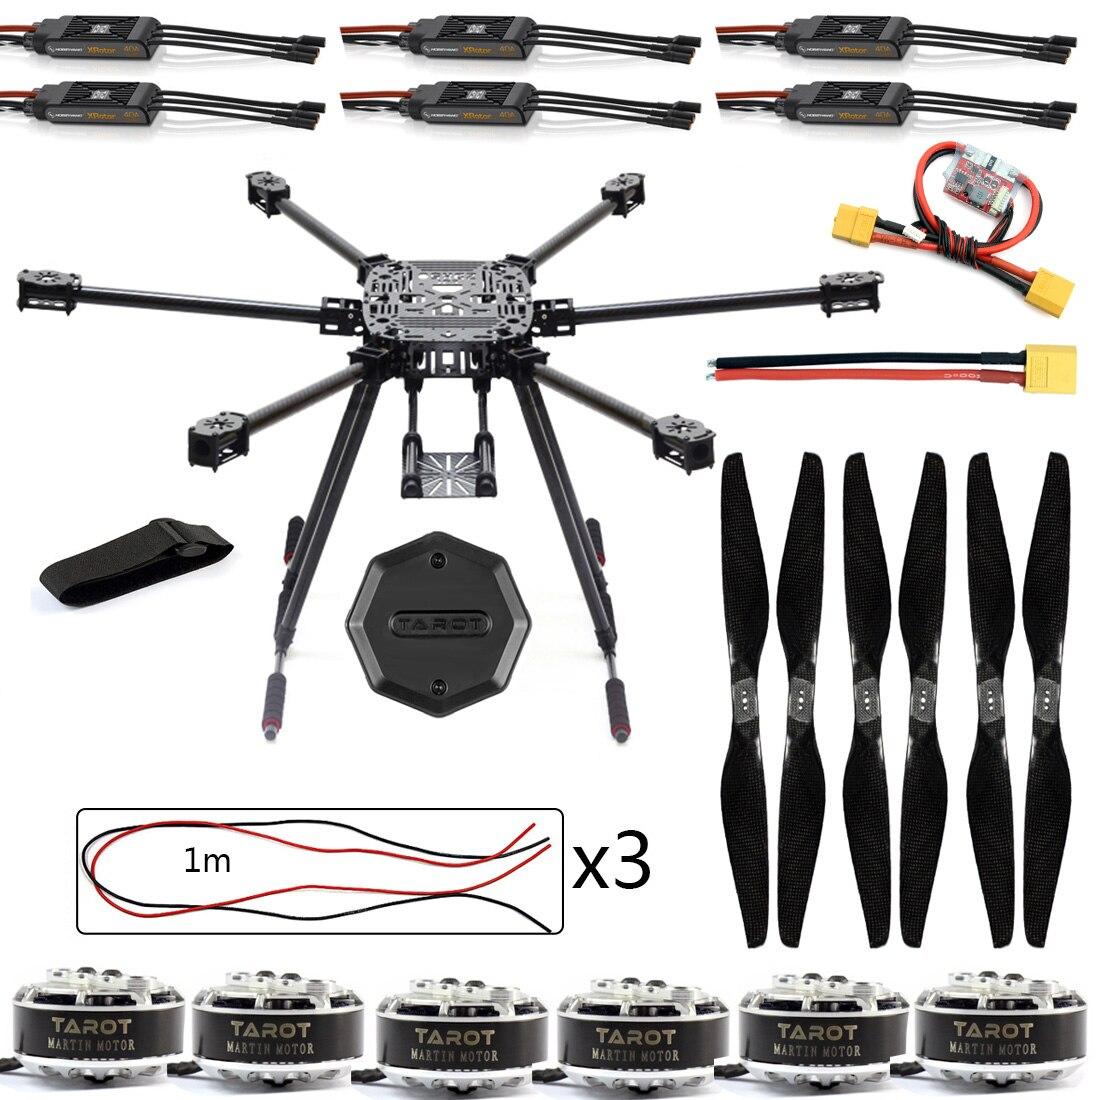 DIY ZD850 Frame Kit with Landing Gear 620KV Motor 40A Brushless ESC Propellers XT60 Plug +Hub for RC 6 axle Hexacopter F19833 A